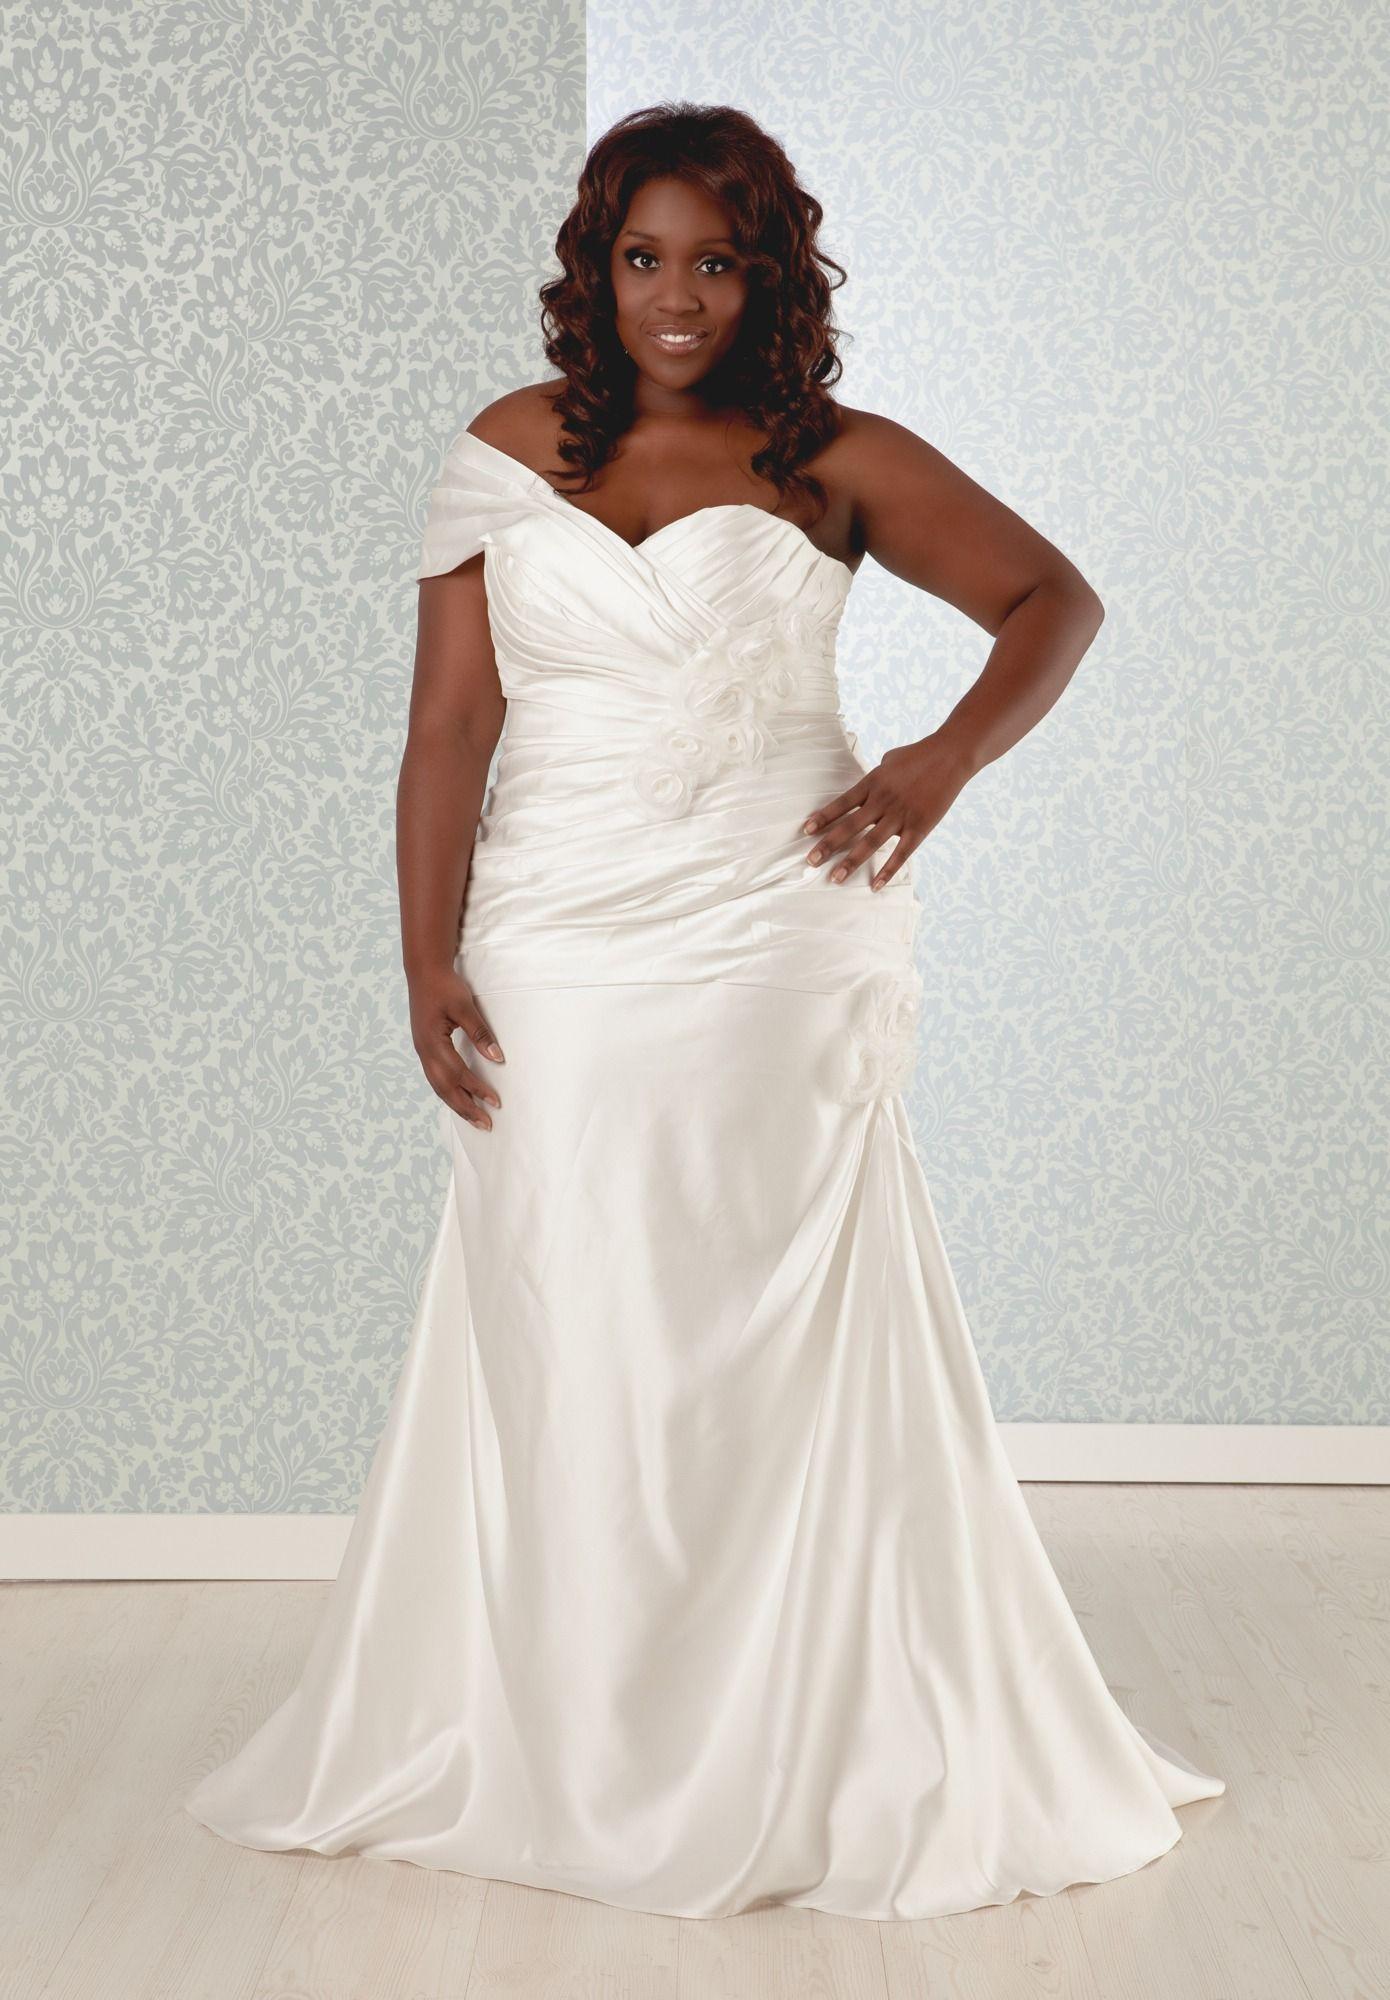 Wedding Dress Sample Sale.499 Plus Size Wedding Dress Sample Sale Real Size Bride Plus